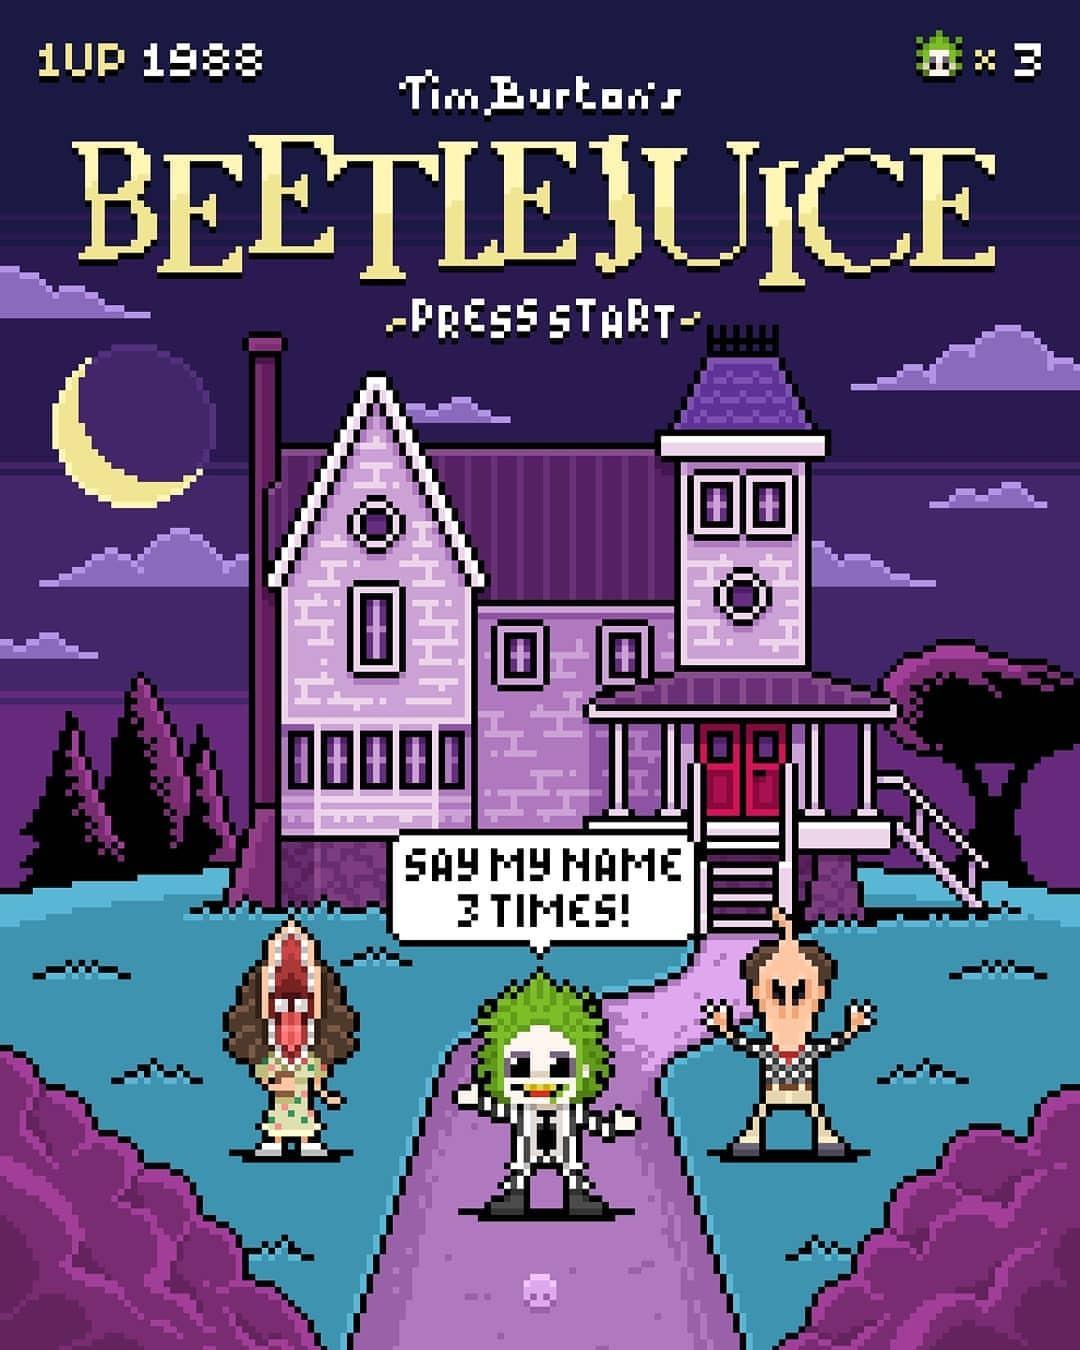 Beetlejuice Beetlejuice Beetlejuice Beetlejuice Know Your Meme